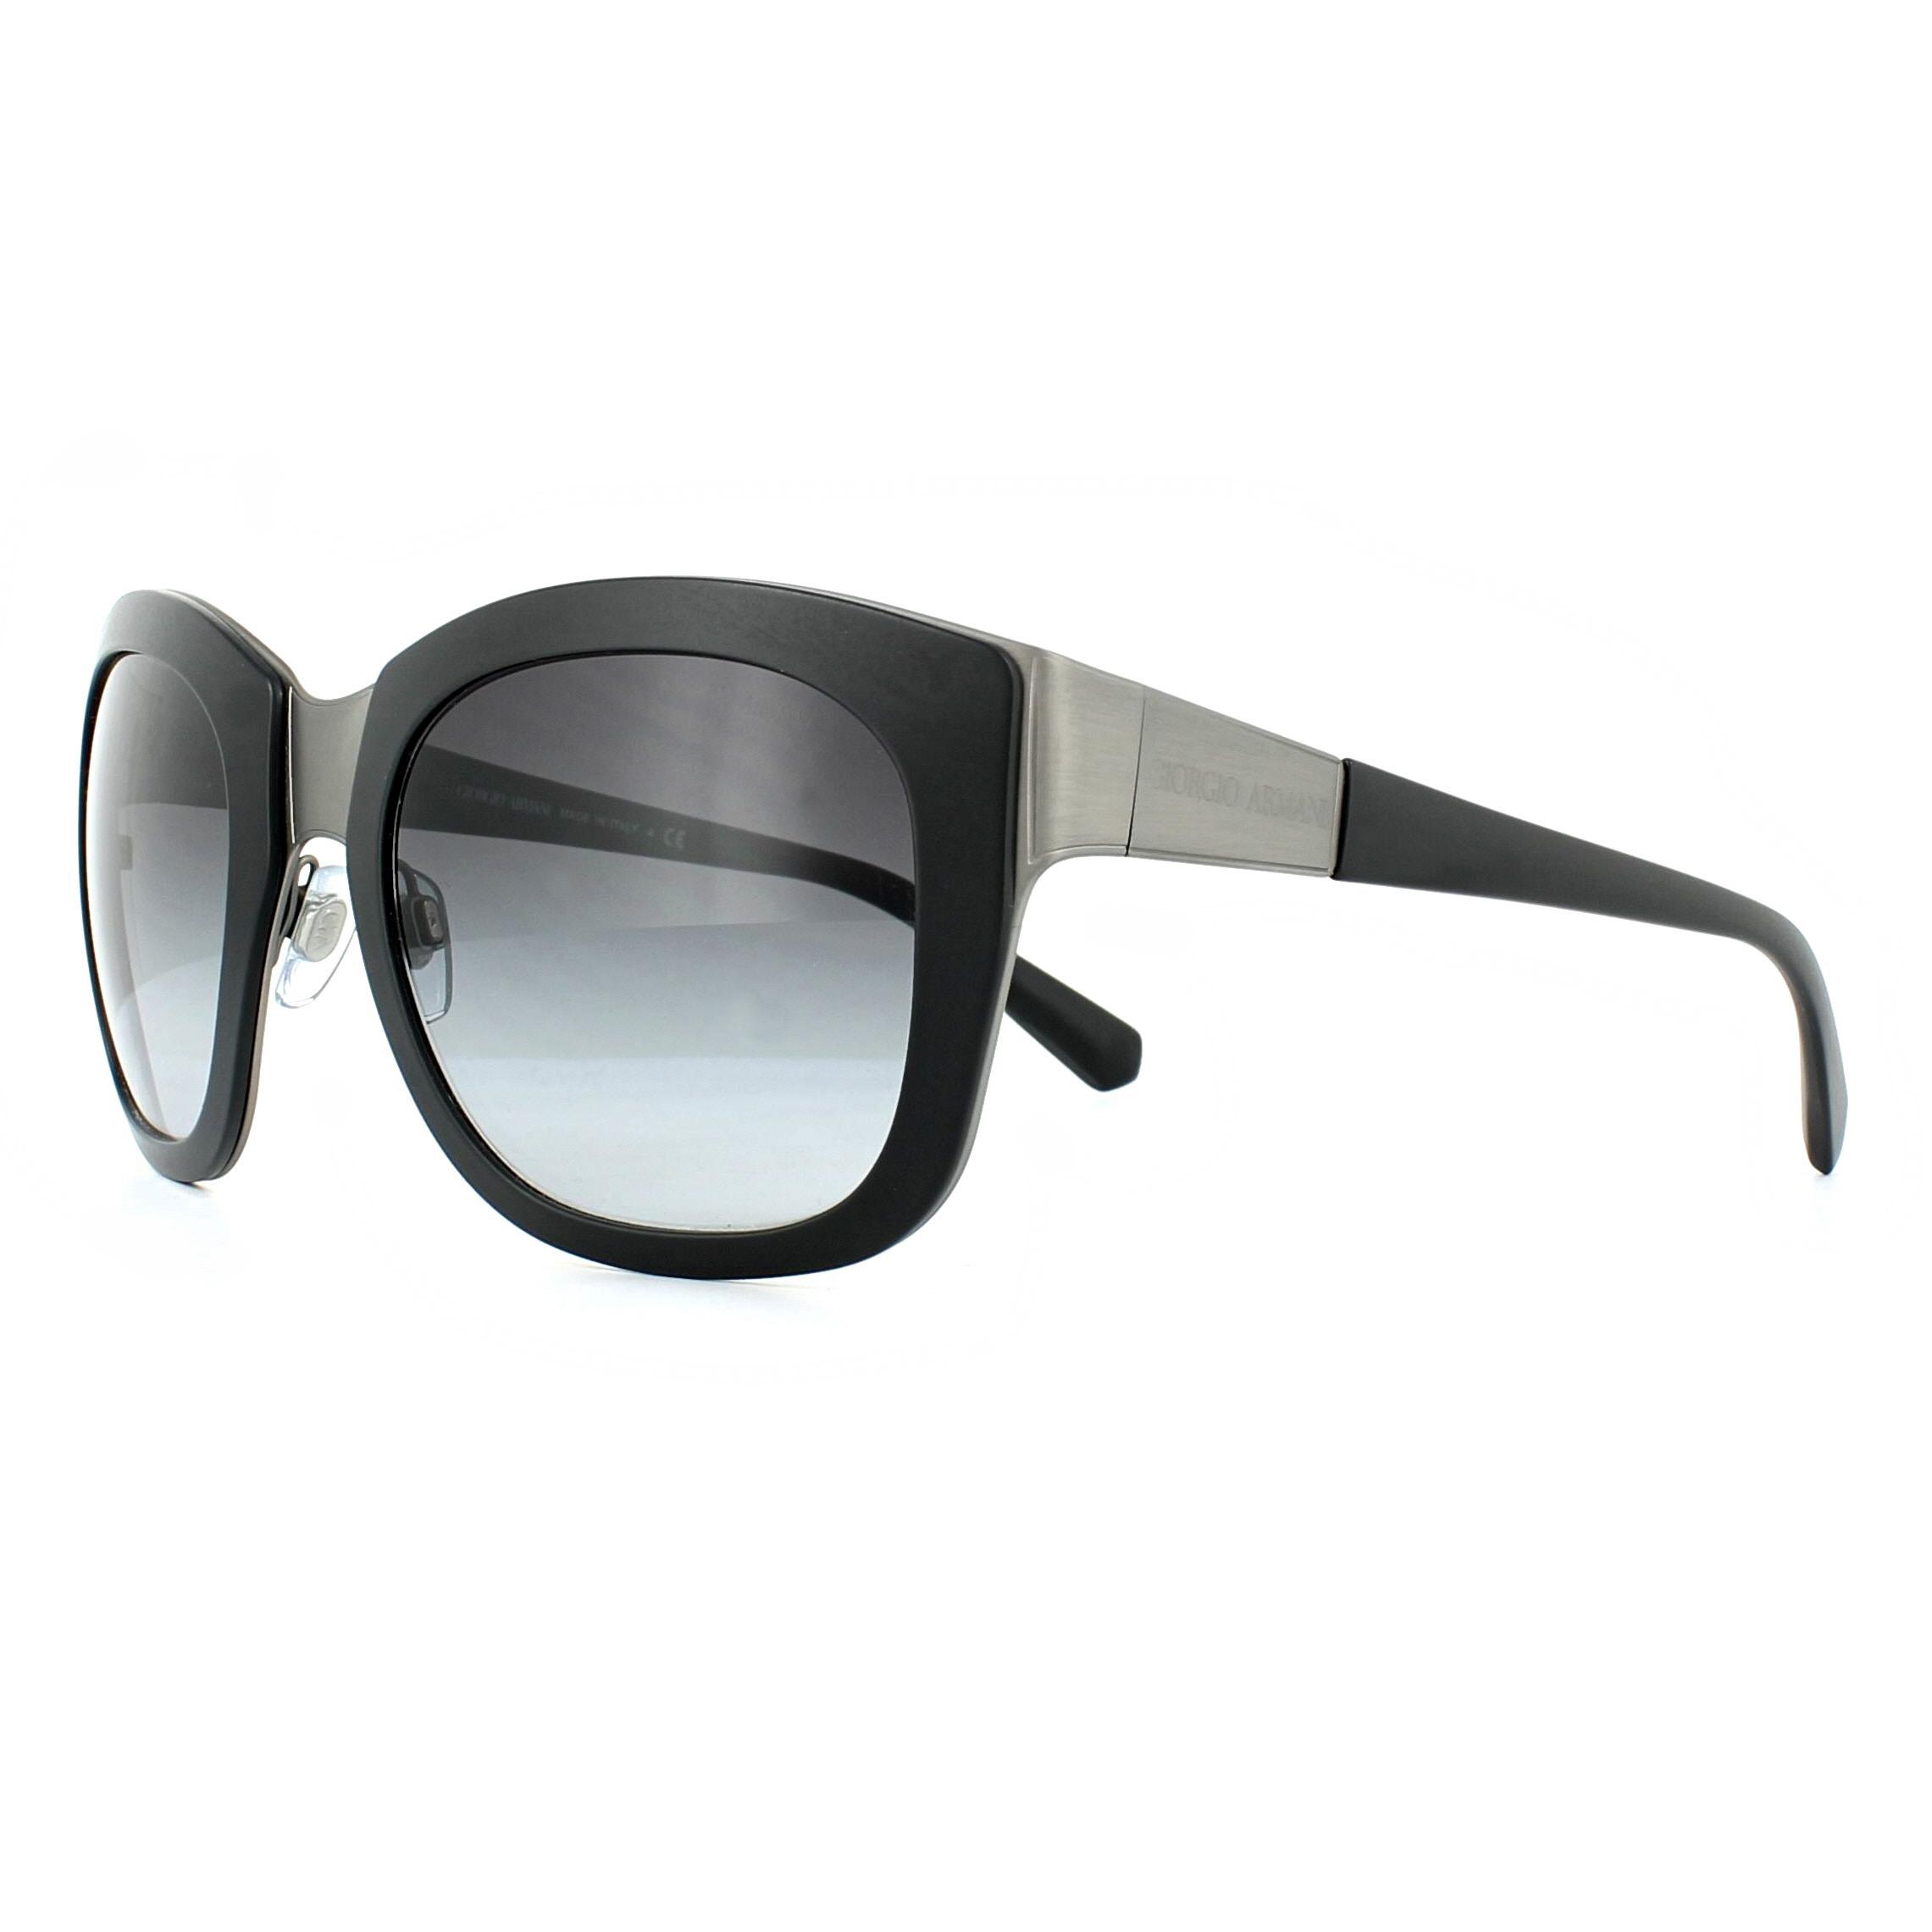 5a33b9a3da80 Sentinel Giorgio Armani Sunglasses AR6010 30328G Black Grey Gradient